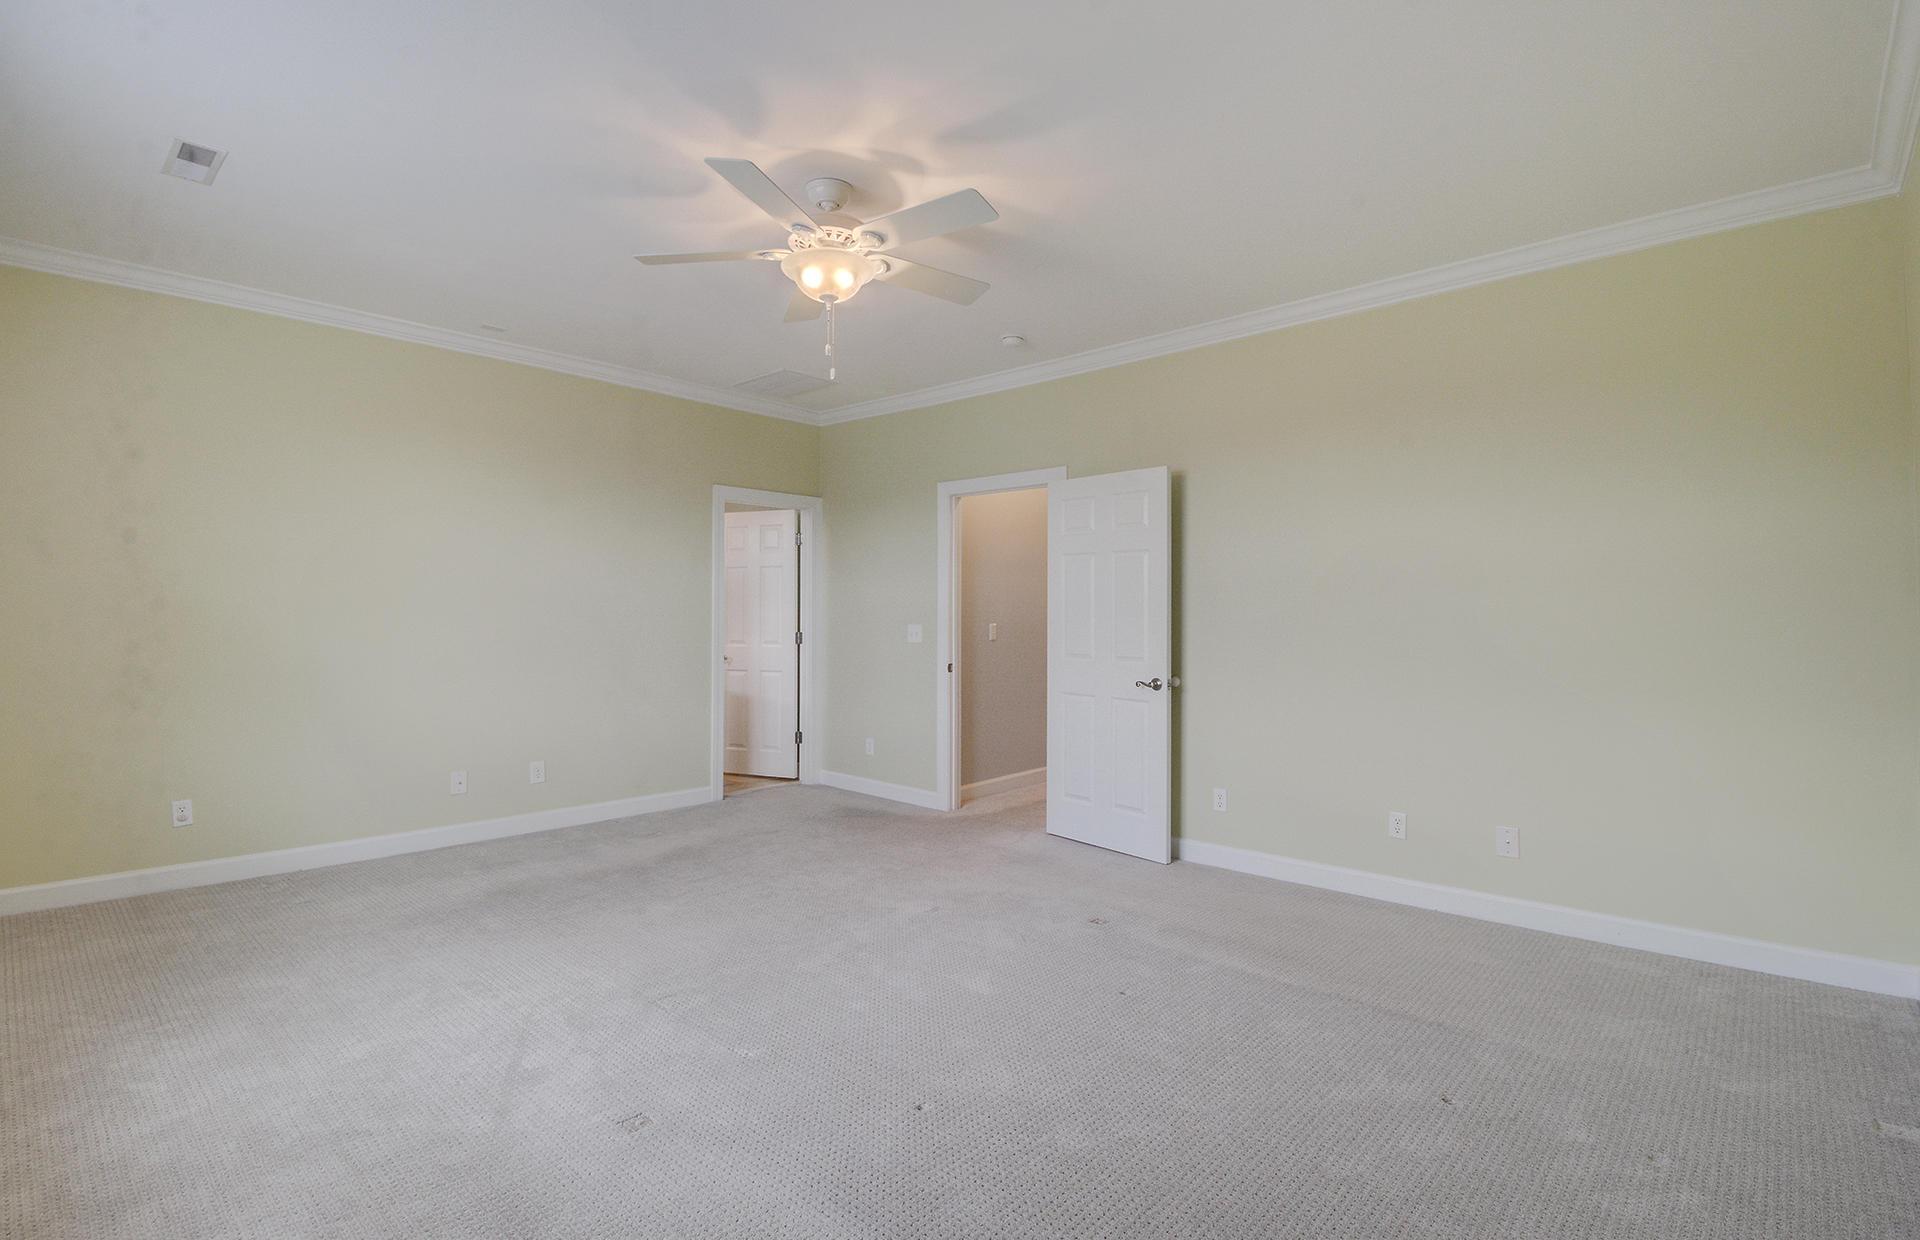 Daniel Island Homes For Sale - 306 Ladd, Charleston, SC - 19